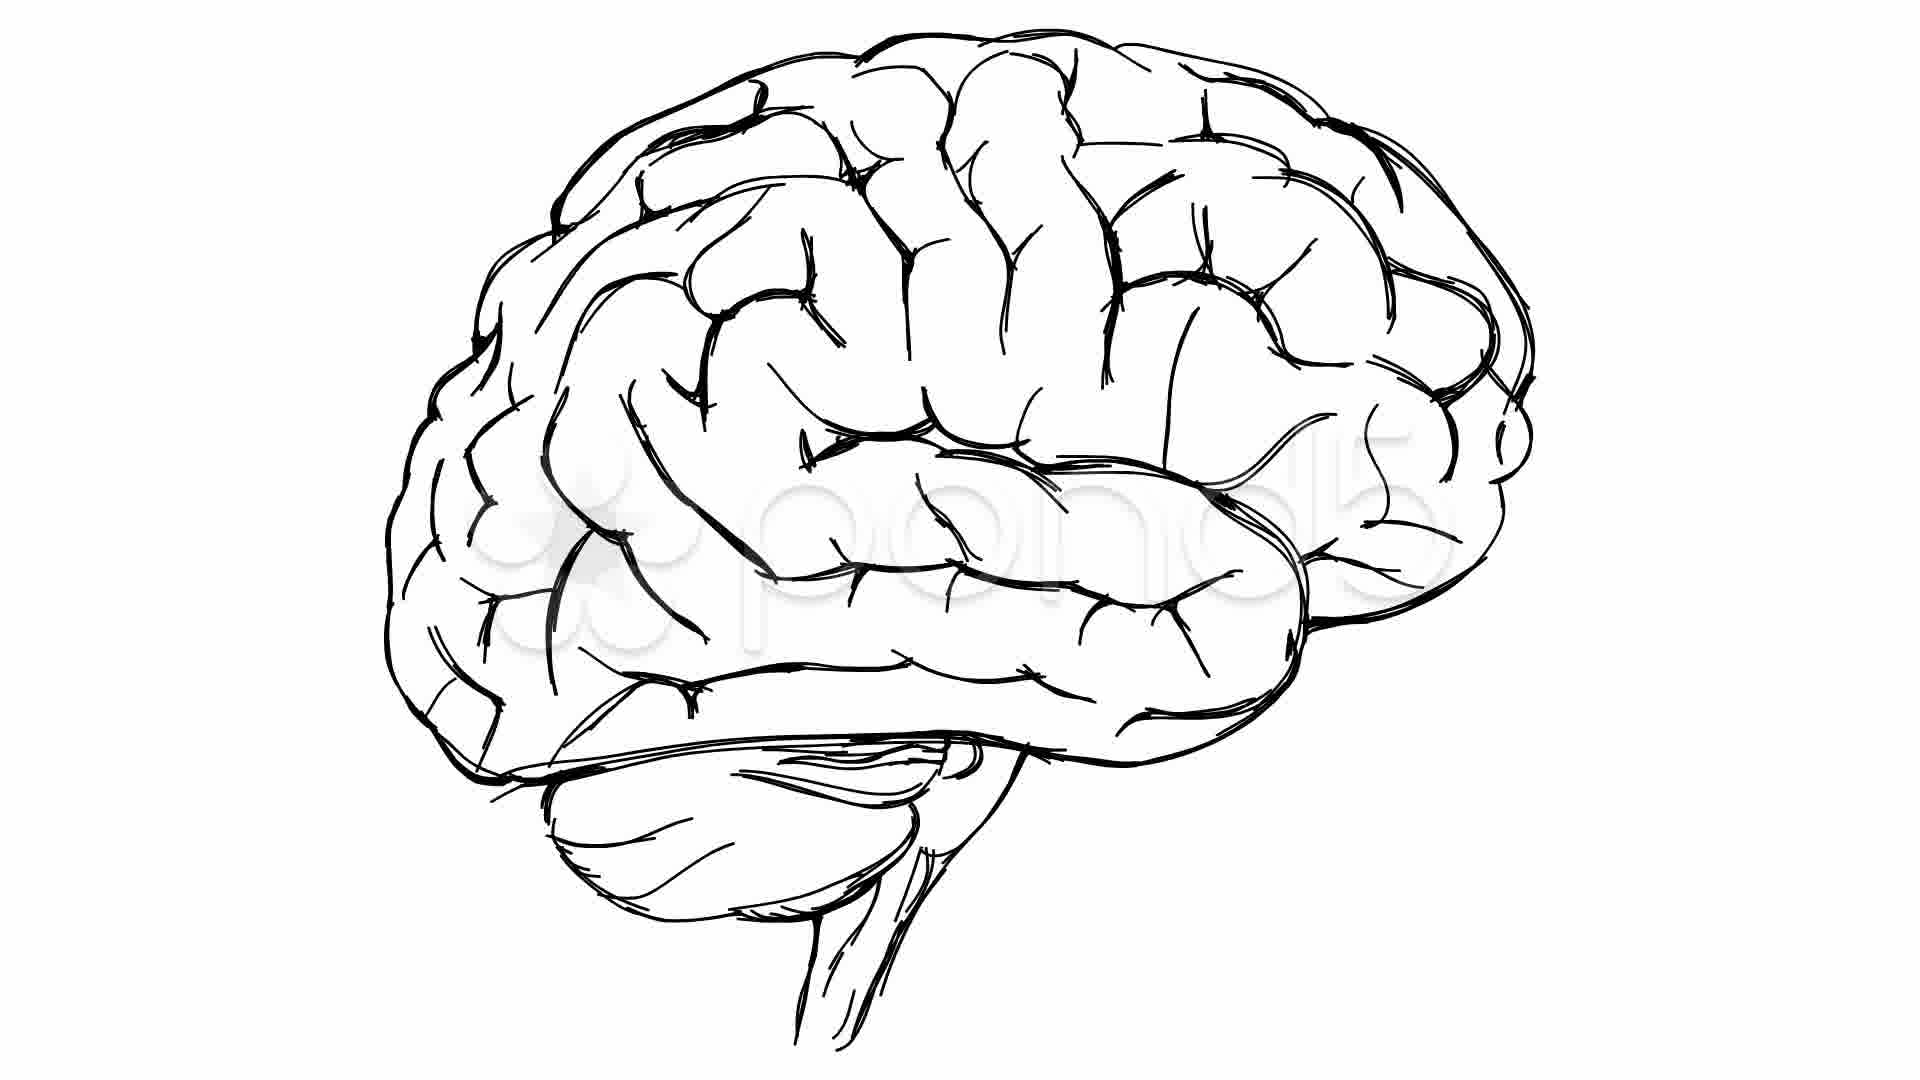 1920x1080 Brain Sketch ~ Video Clip Royalty Free